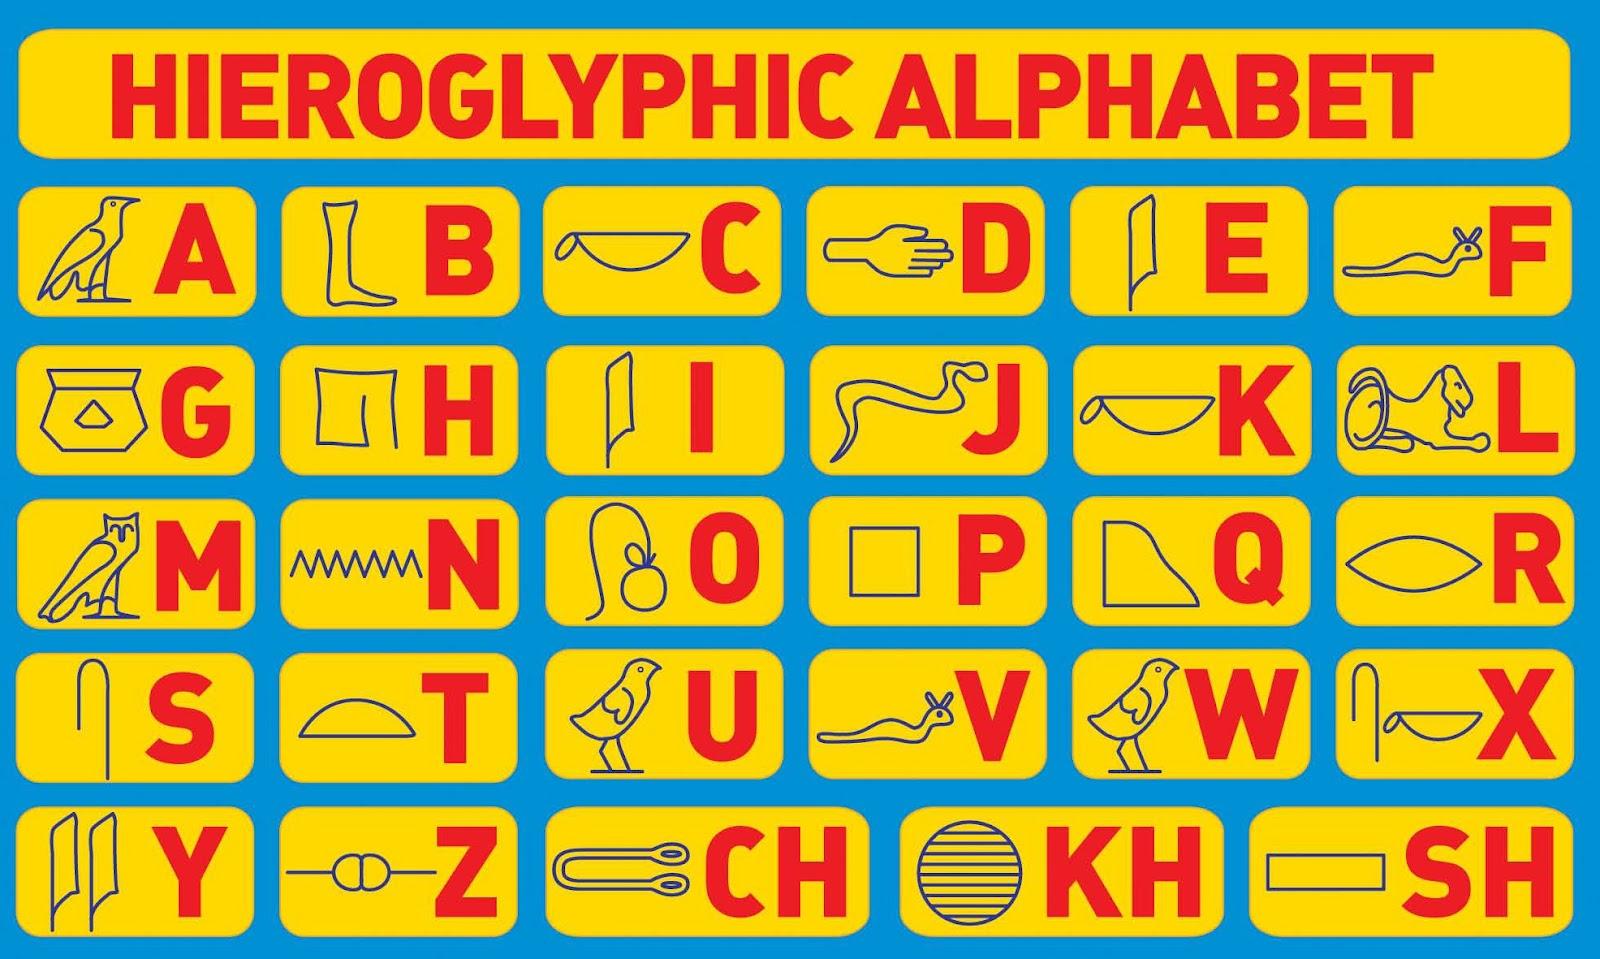 Printable Hieroglyphic Alphabet